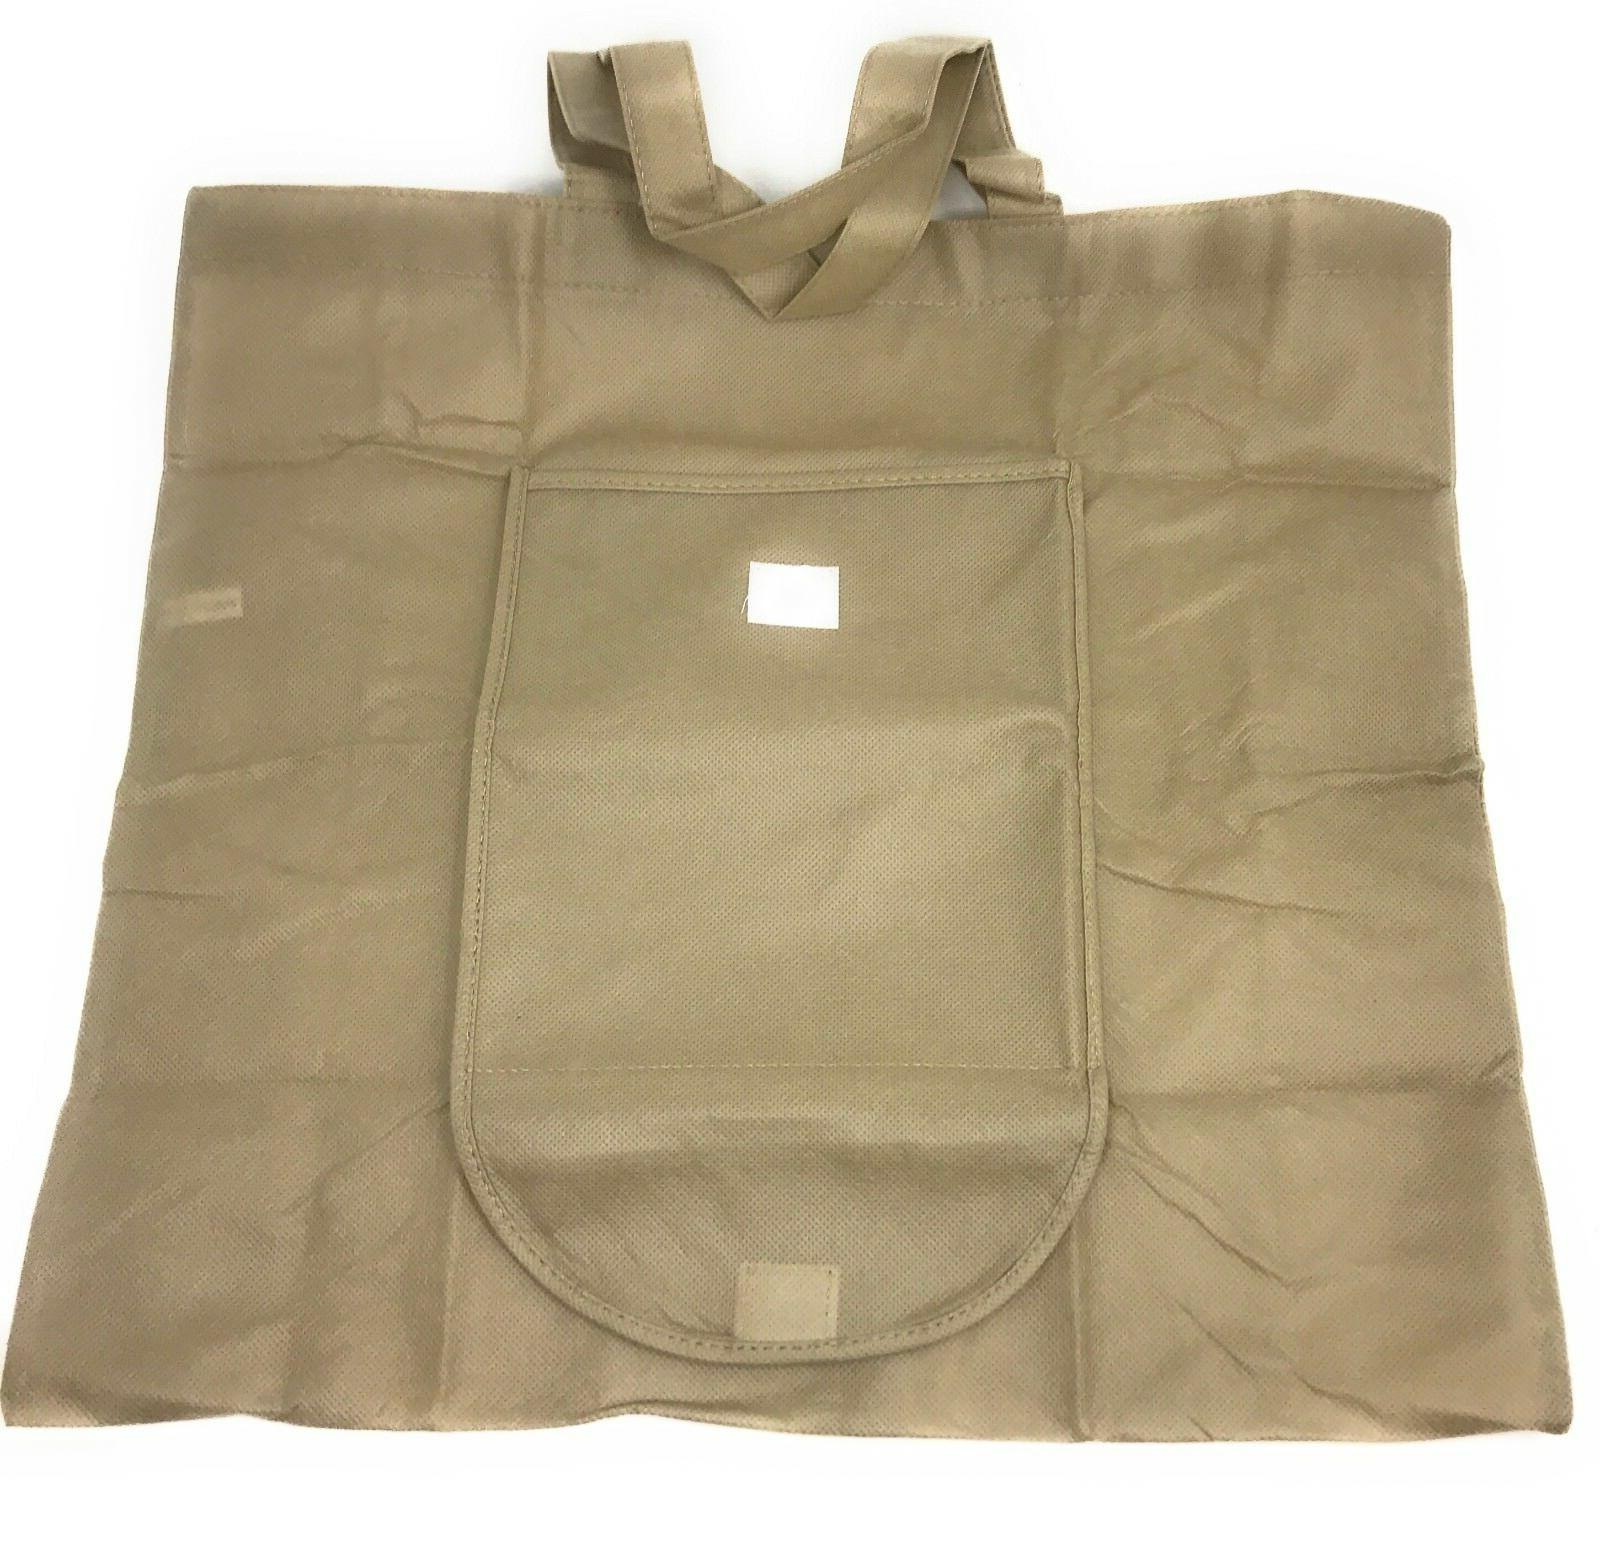 3 Large Reusable Shopping Bags